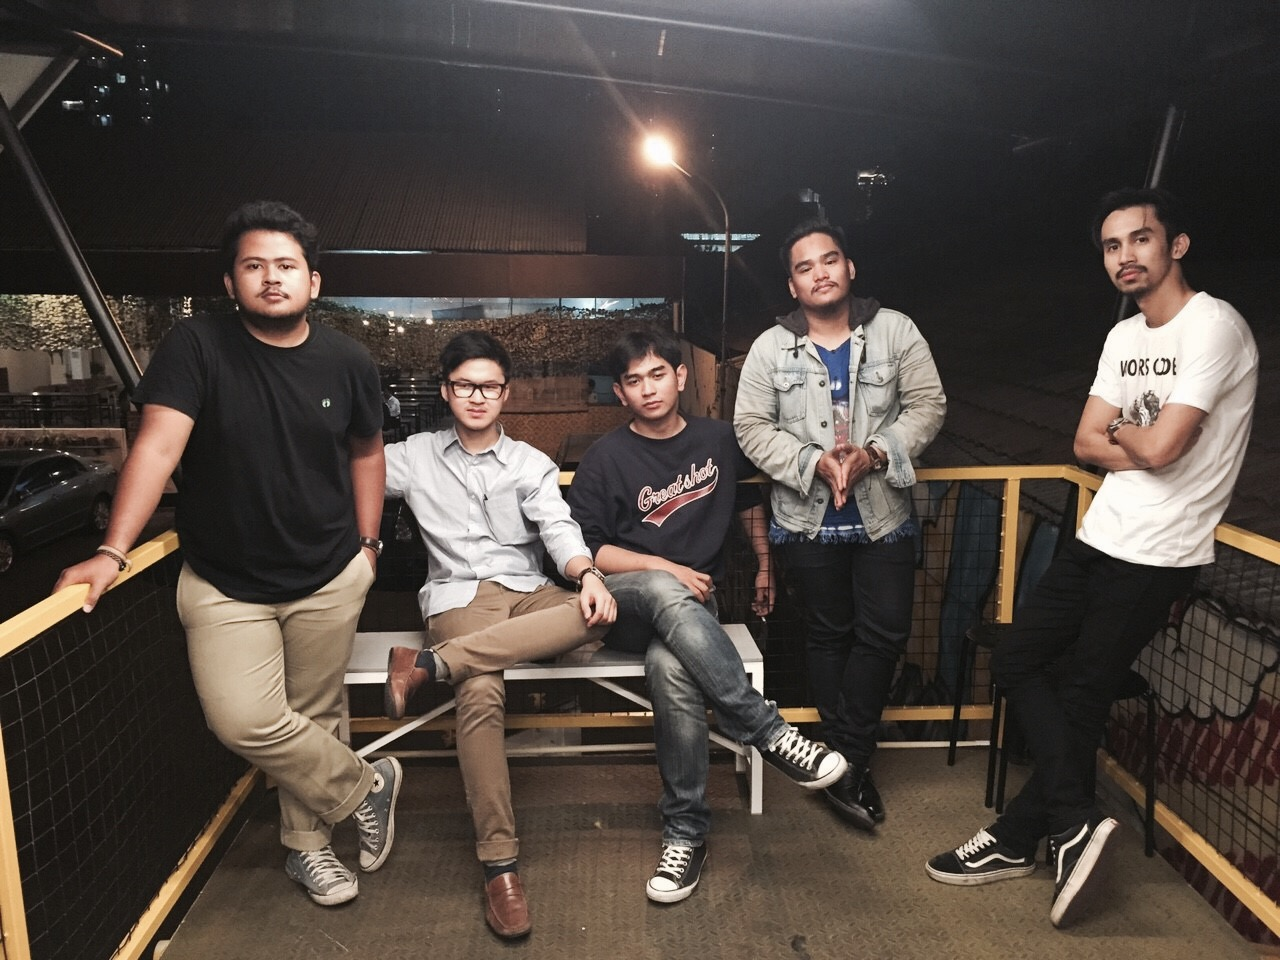 Foto band bigbang